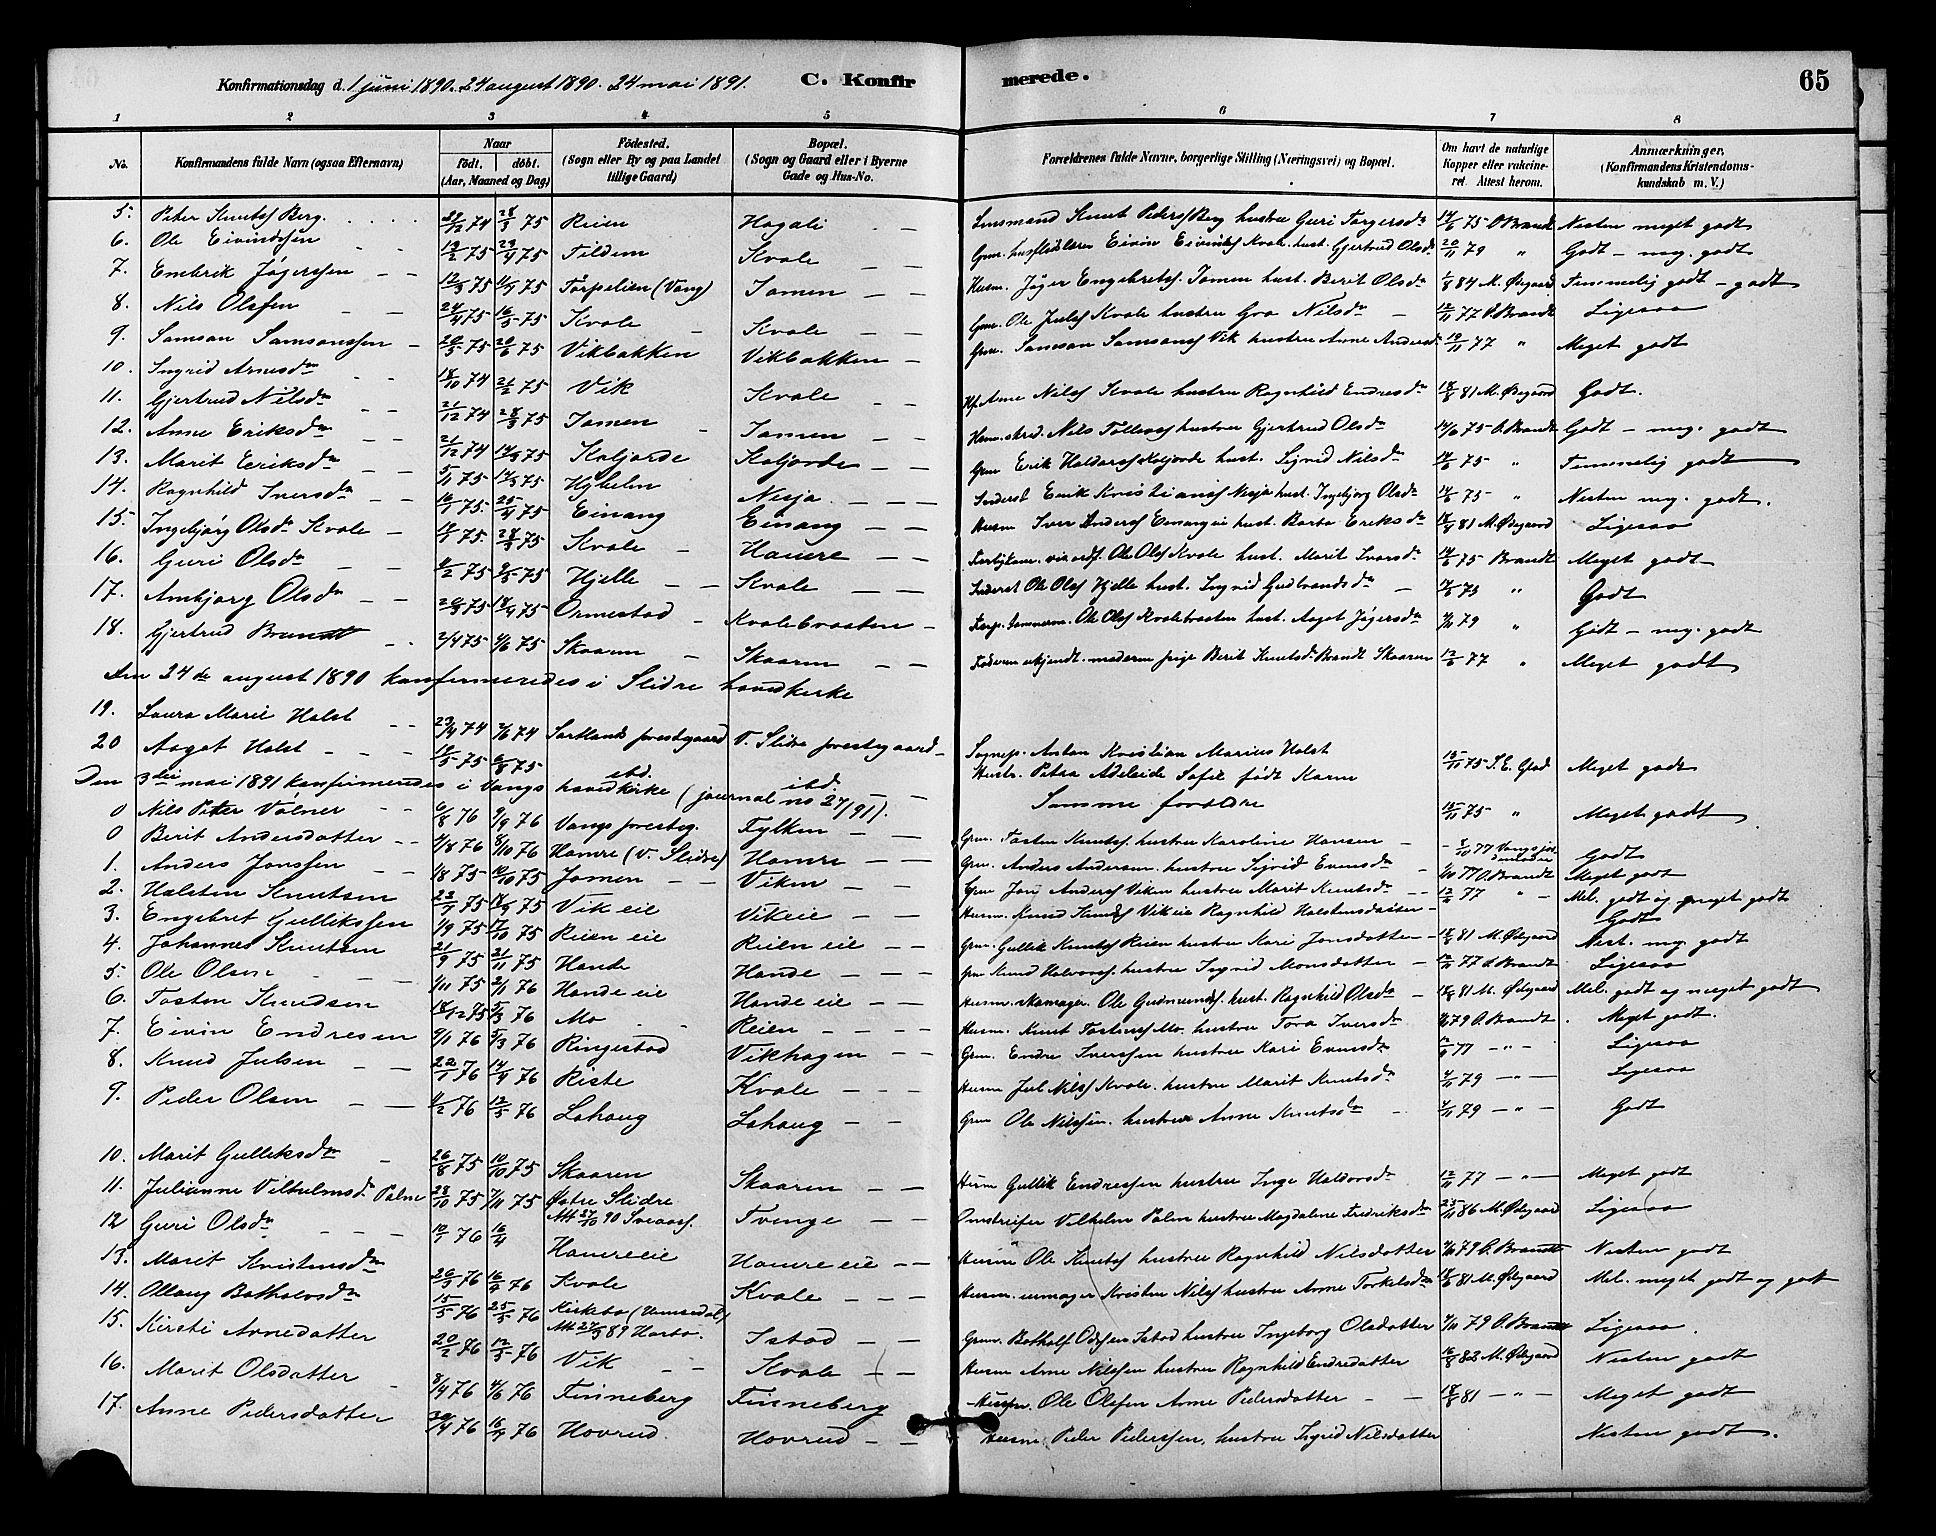 SAH, Vestre Slidre prestekontor, Klokkerbok nr. 4, 1881-1912, s. 65